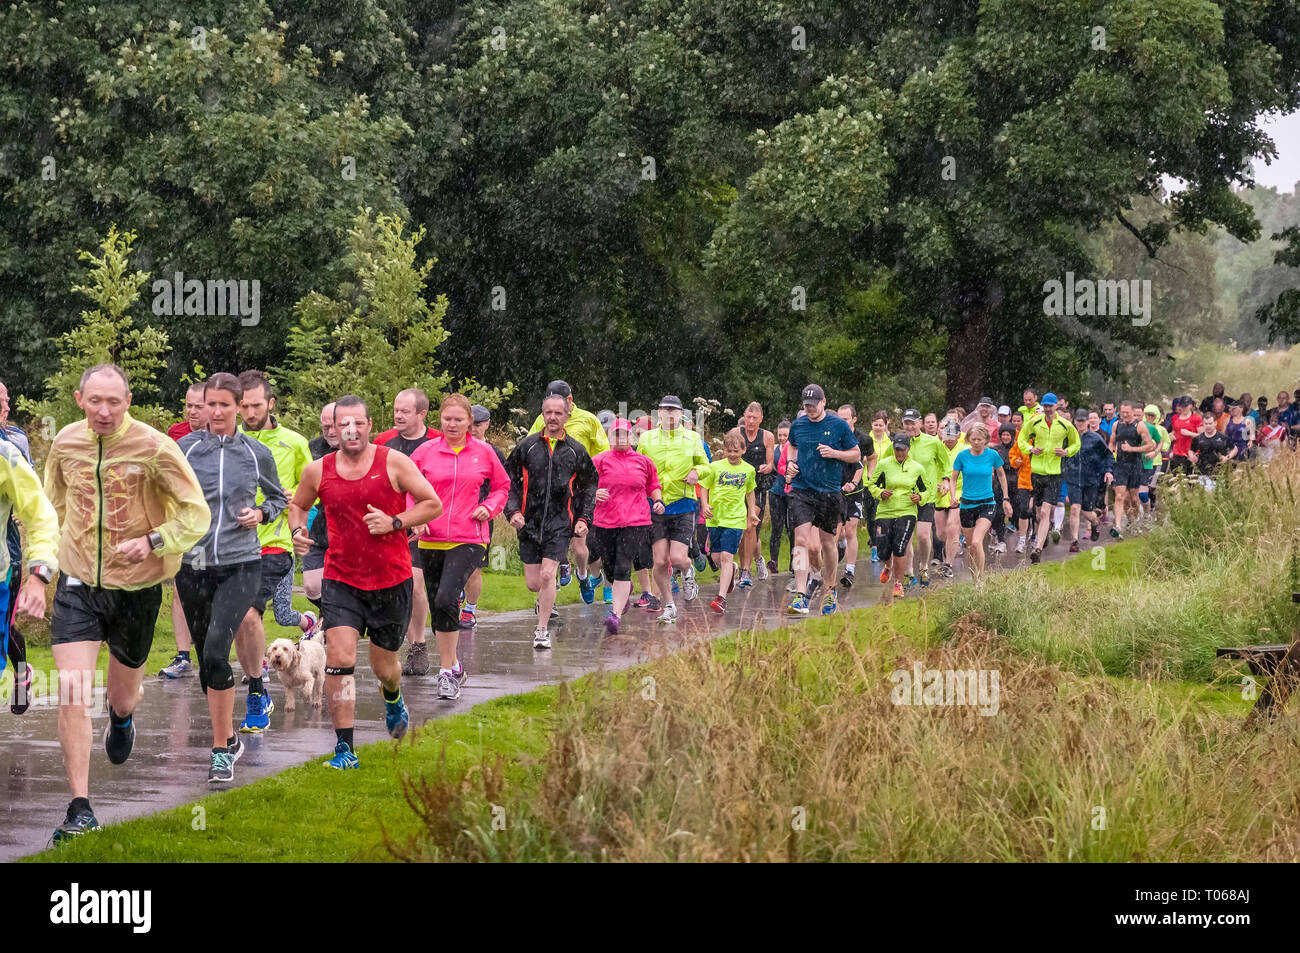 Wet day fun runners - Stock Image